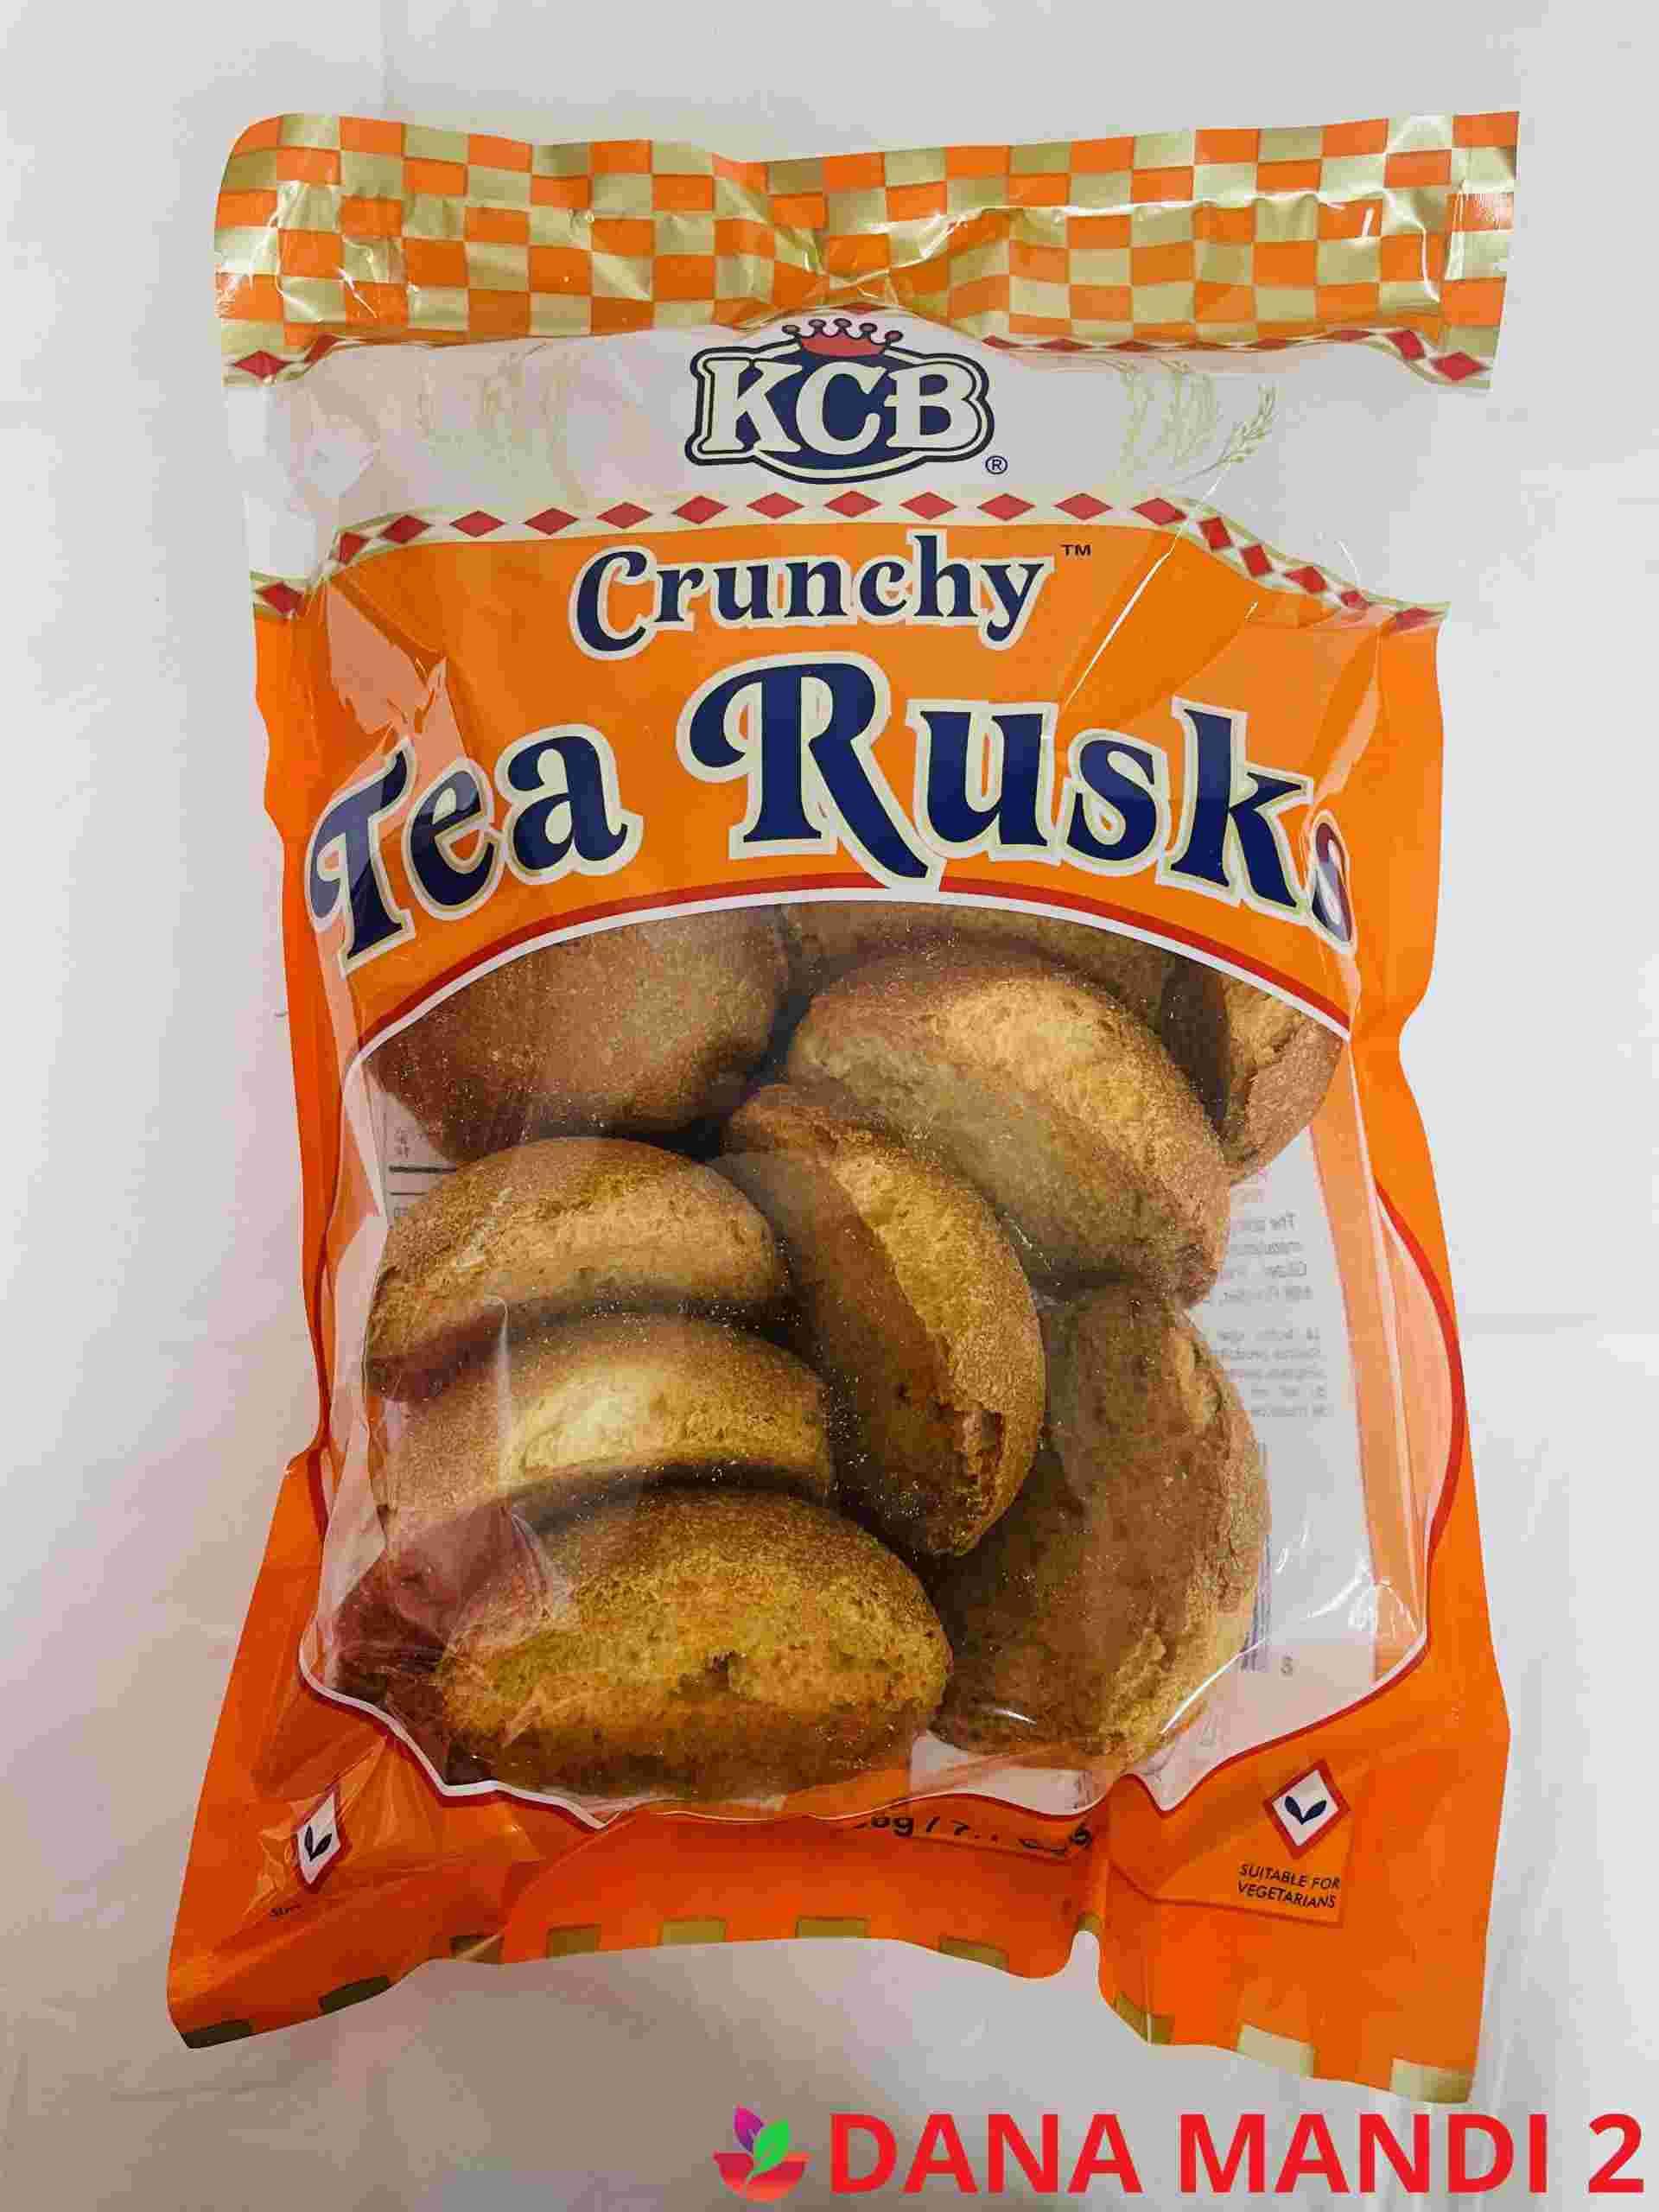 Kcb Crunchy ( Round Tea Rusk )